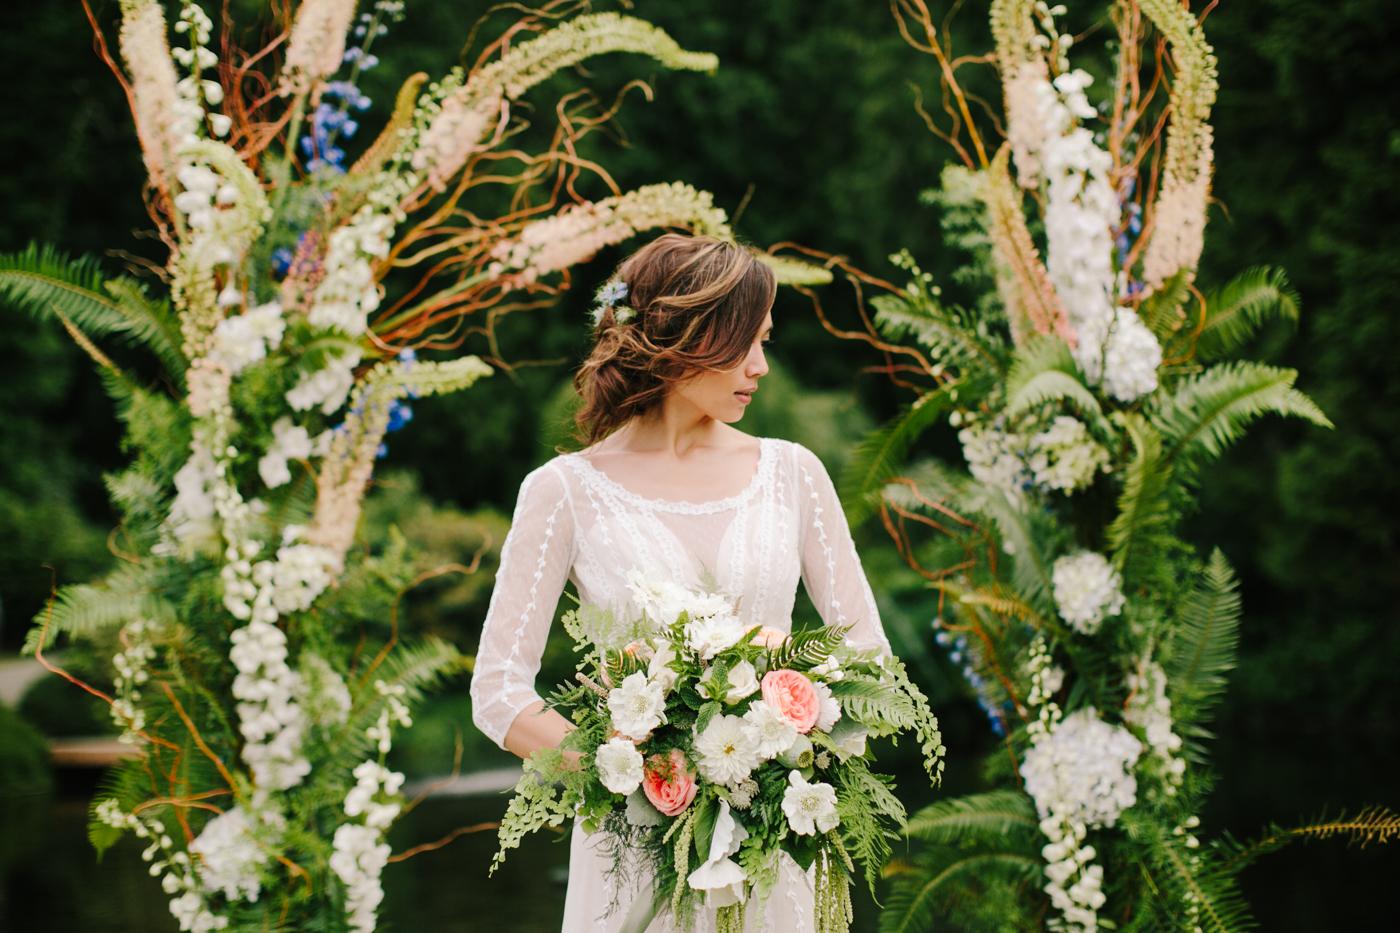 Seattle Wedding Planner | Wedding Wise | Kelley Lemon Photography | Pantone Color of the Year 2017 Greenery